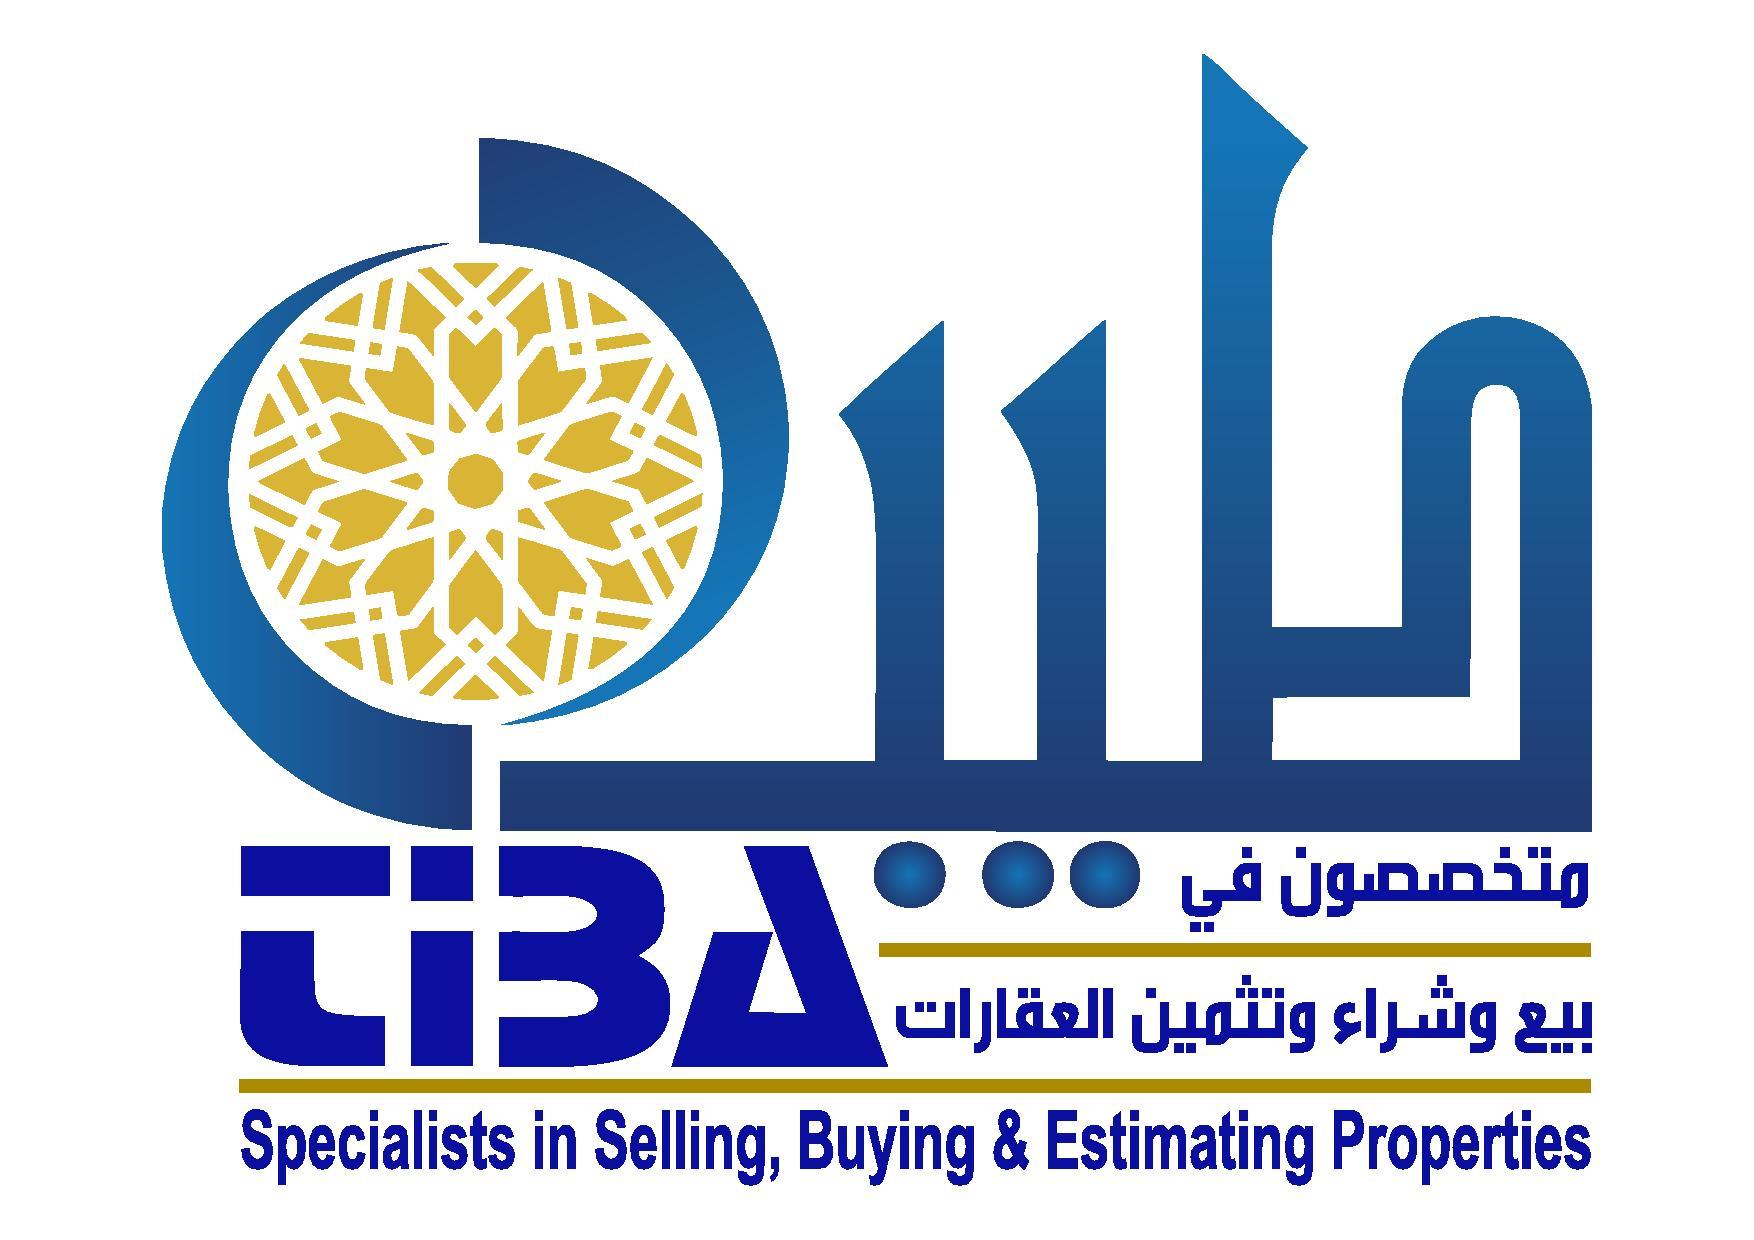 Taiba Real Estate Company